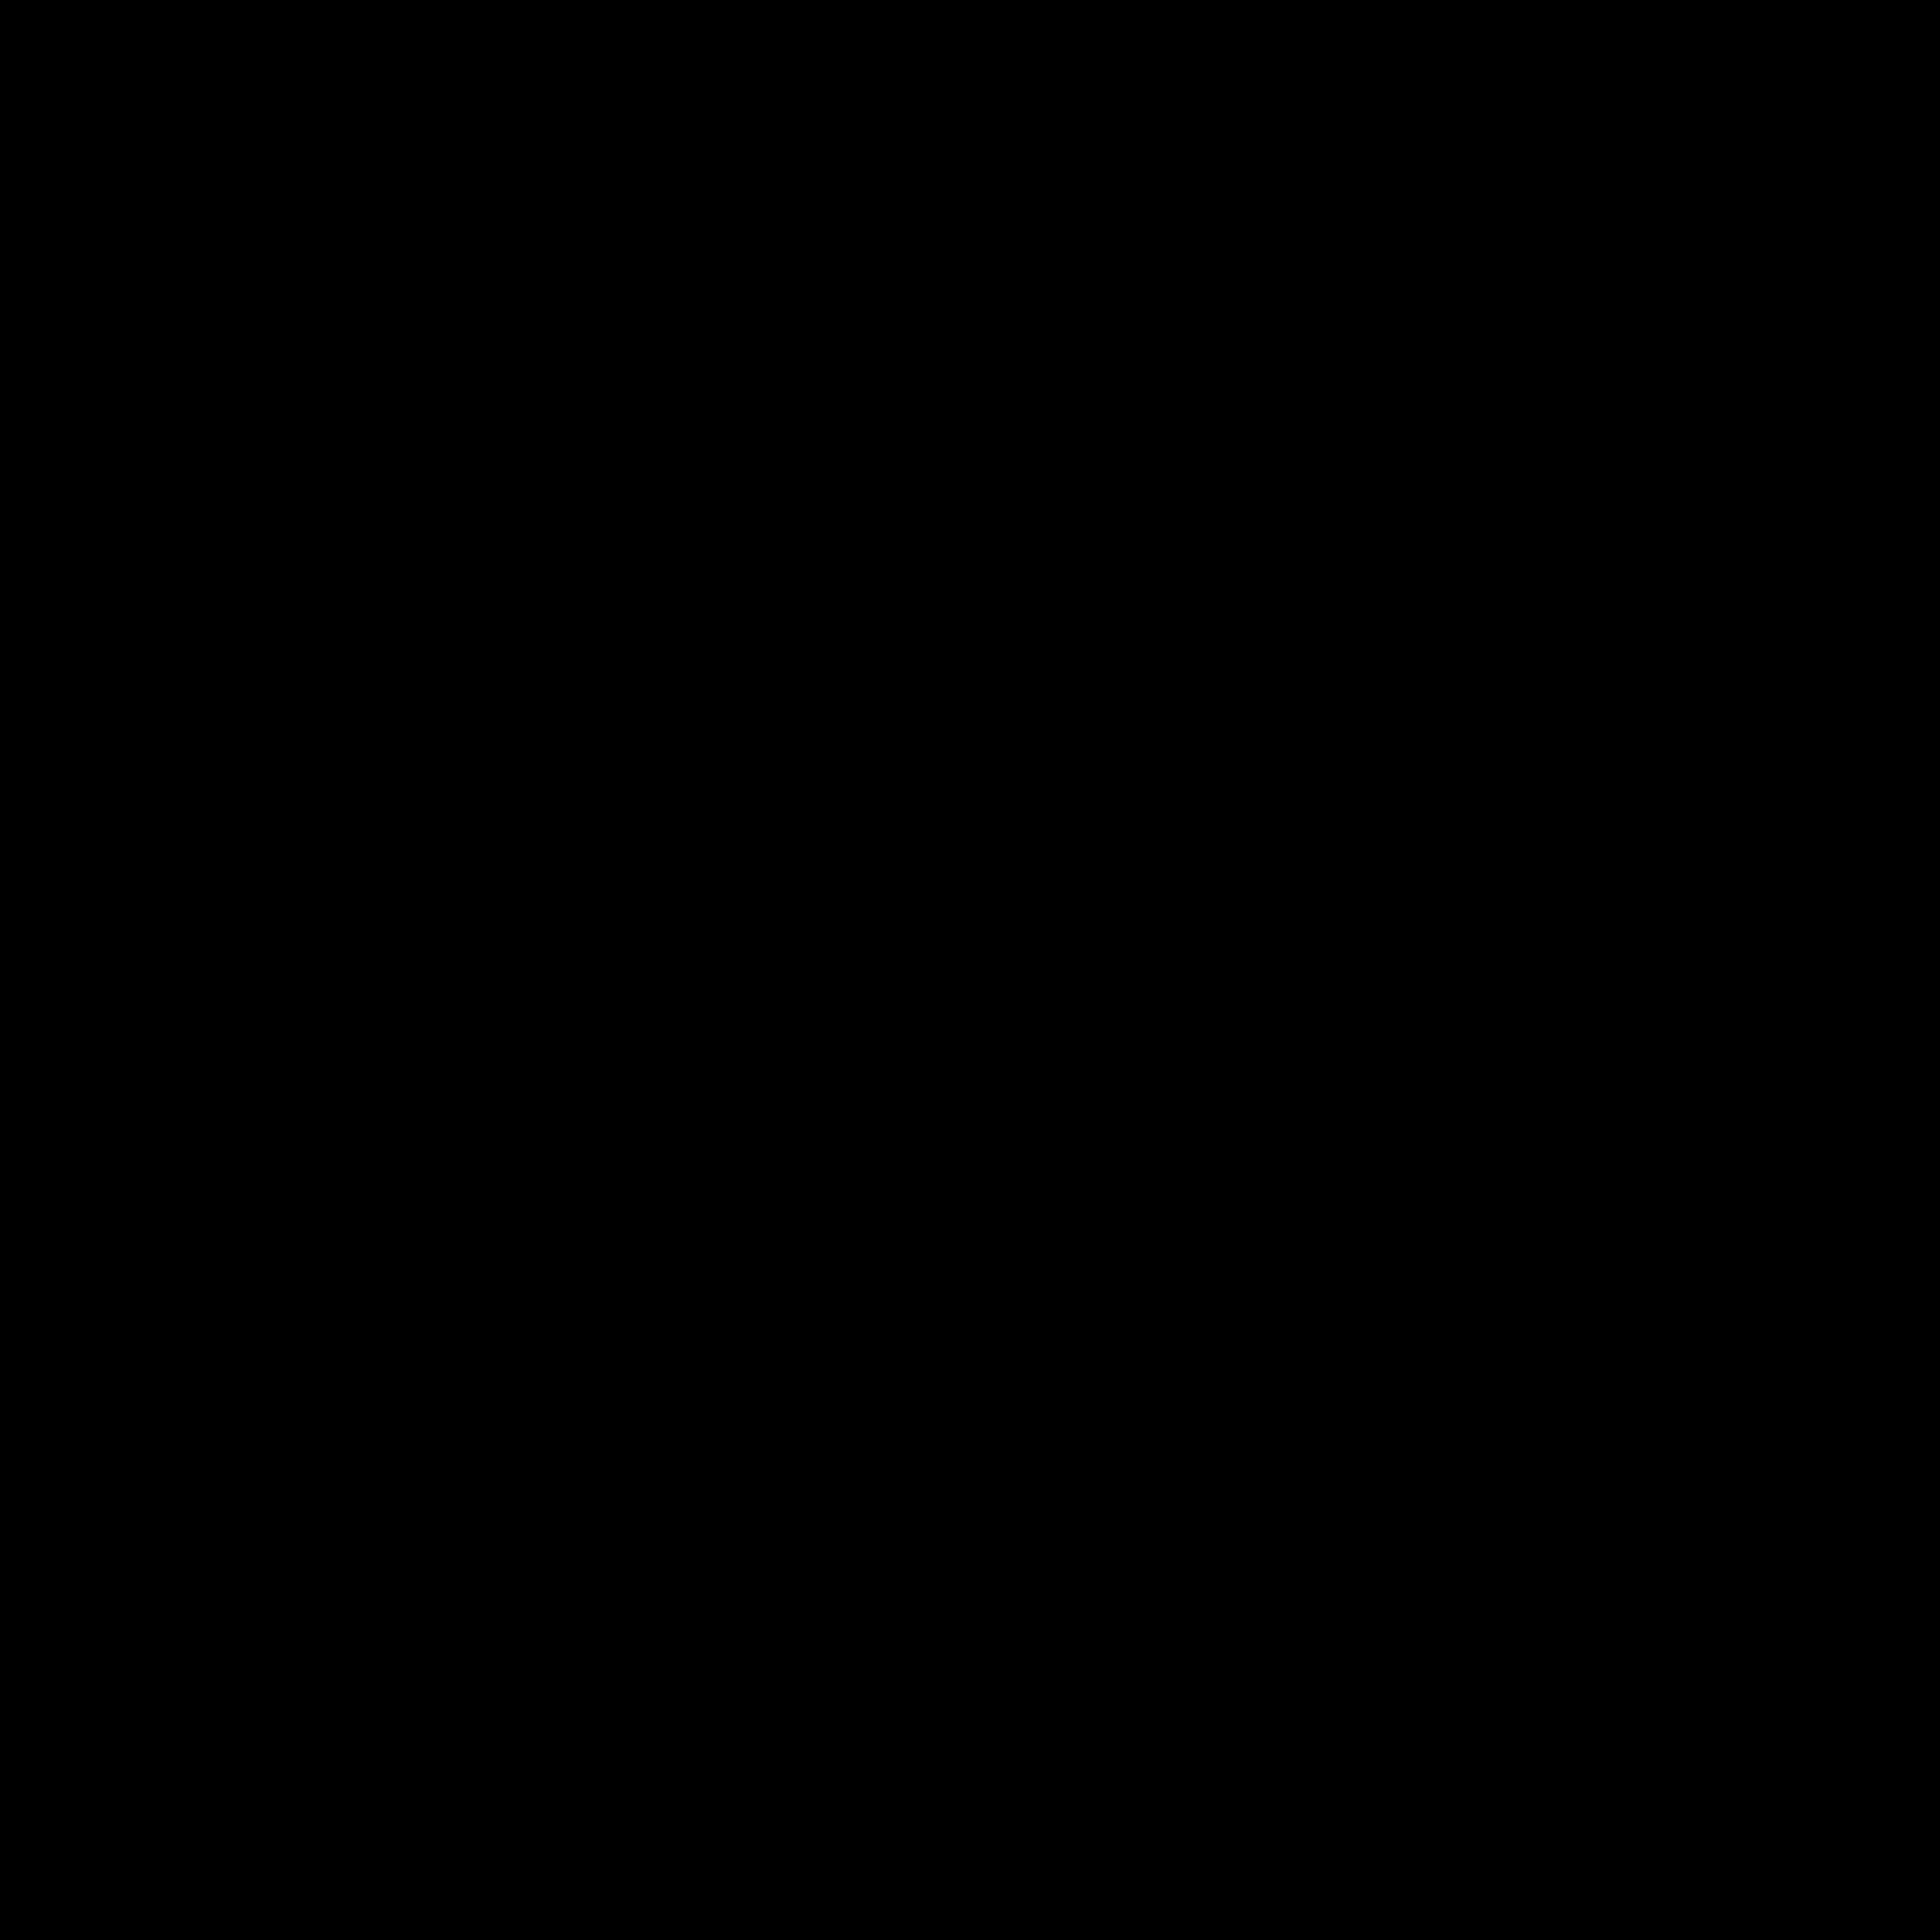 oneill logo 0 - O'Neill Logo